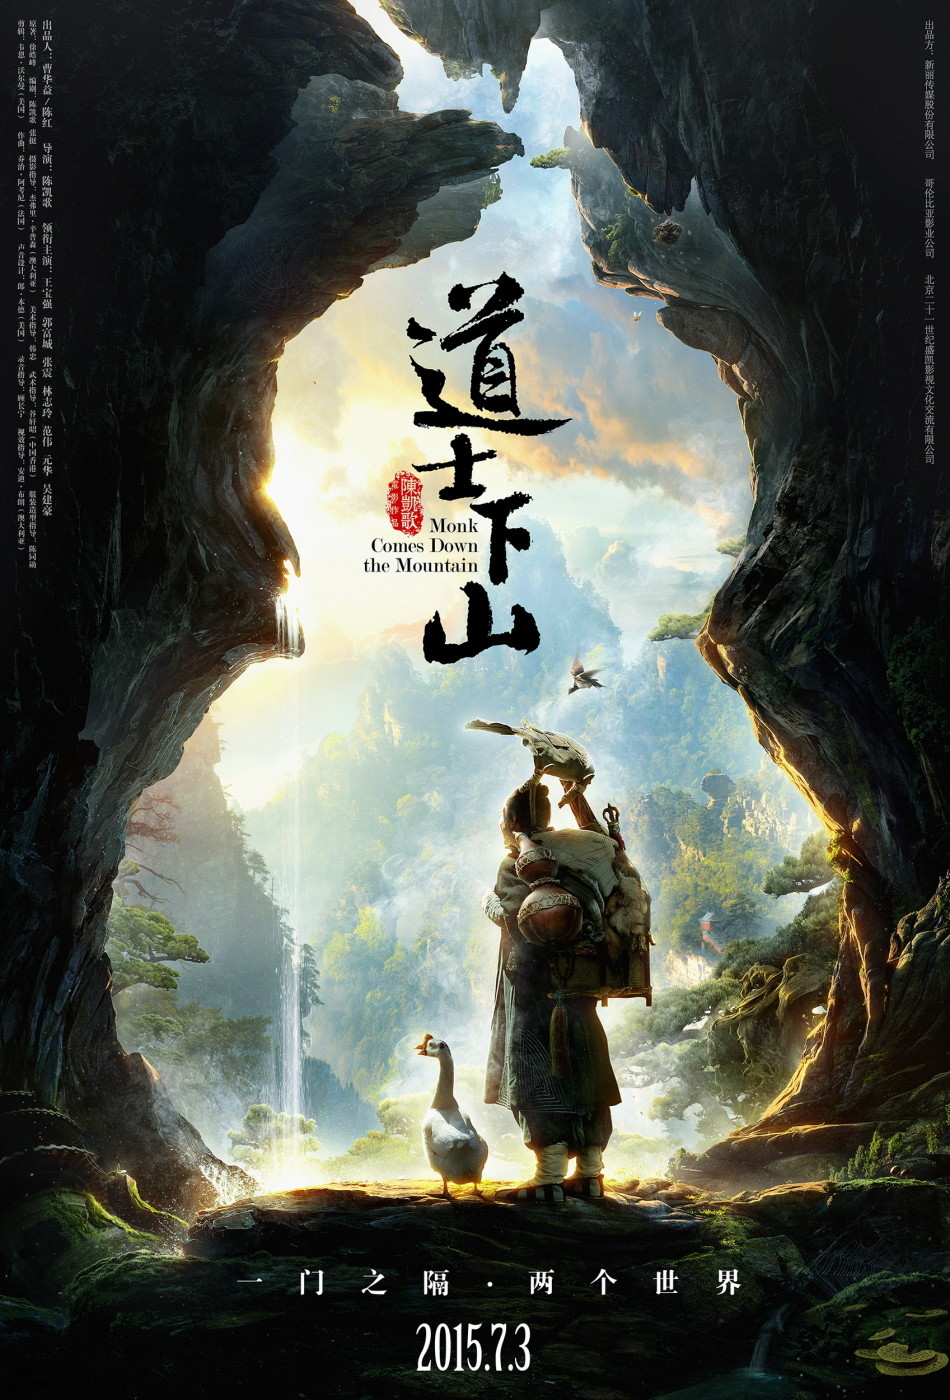 Monk Comes Down the Mountain | Toumei Ningen - The Reviews